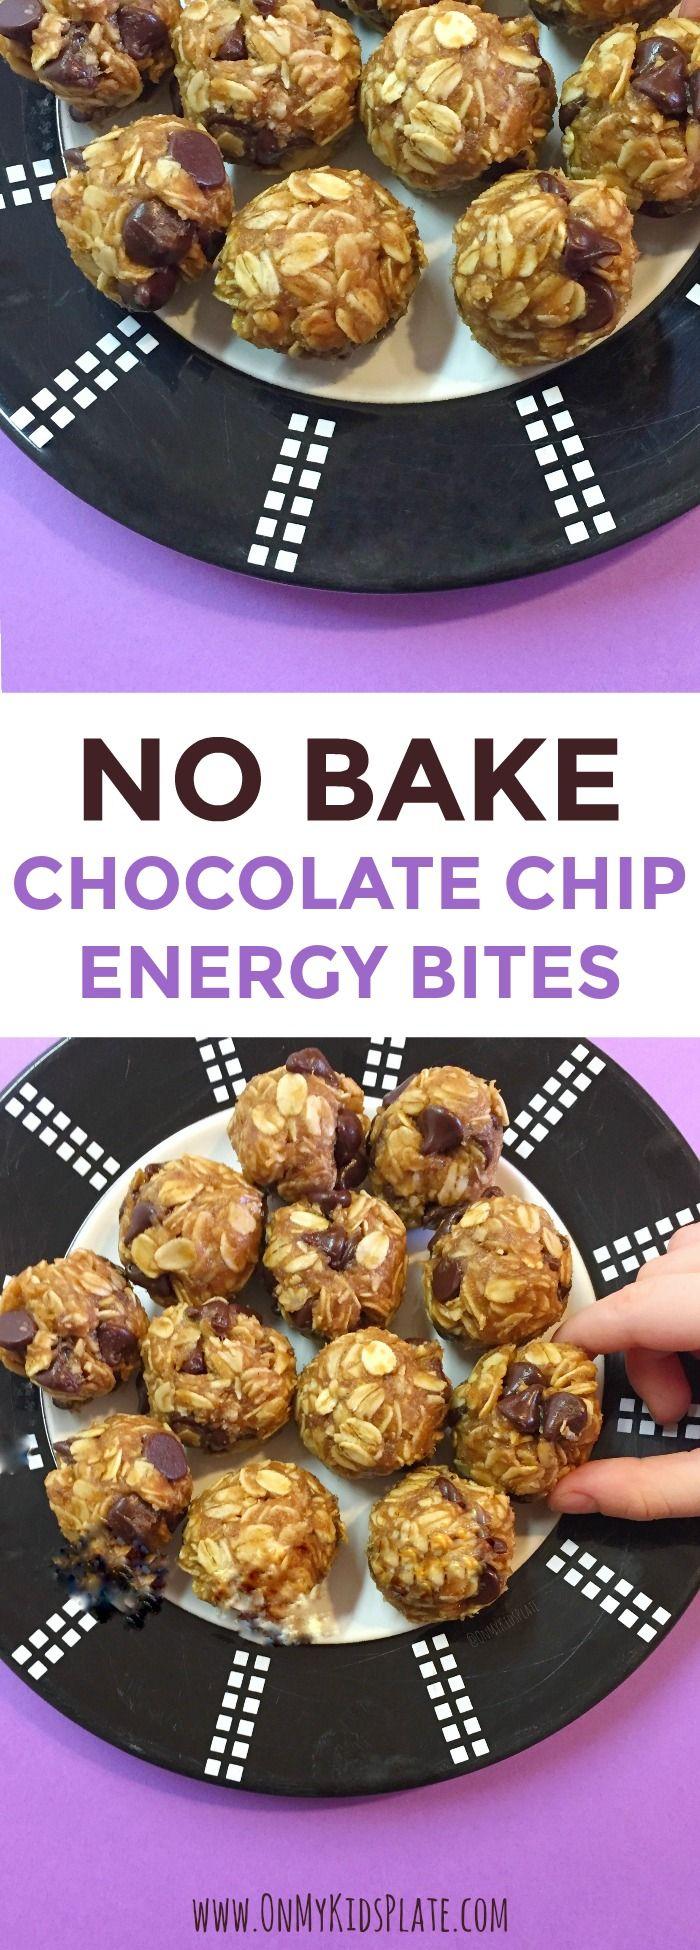 No Bake Chocolate Chip Energy Bites - On My Kids Plate